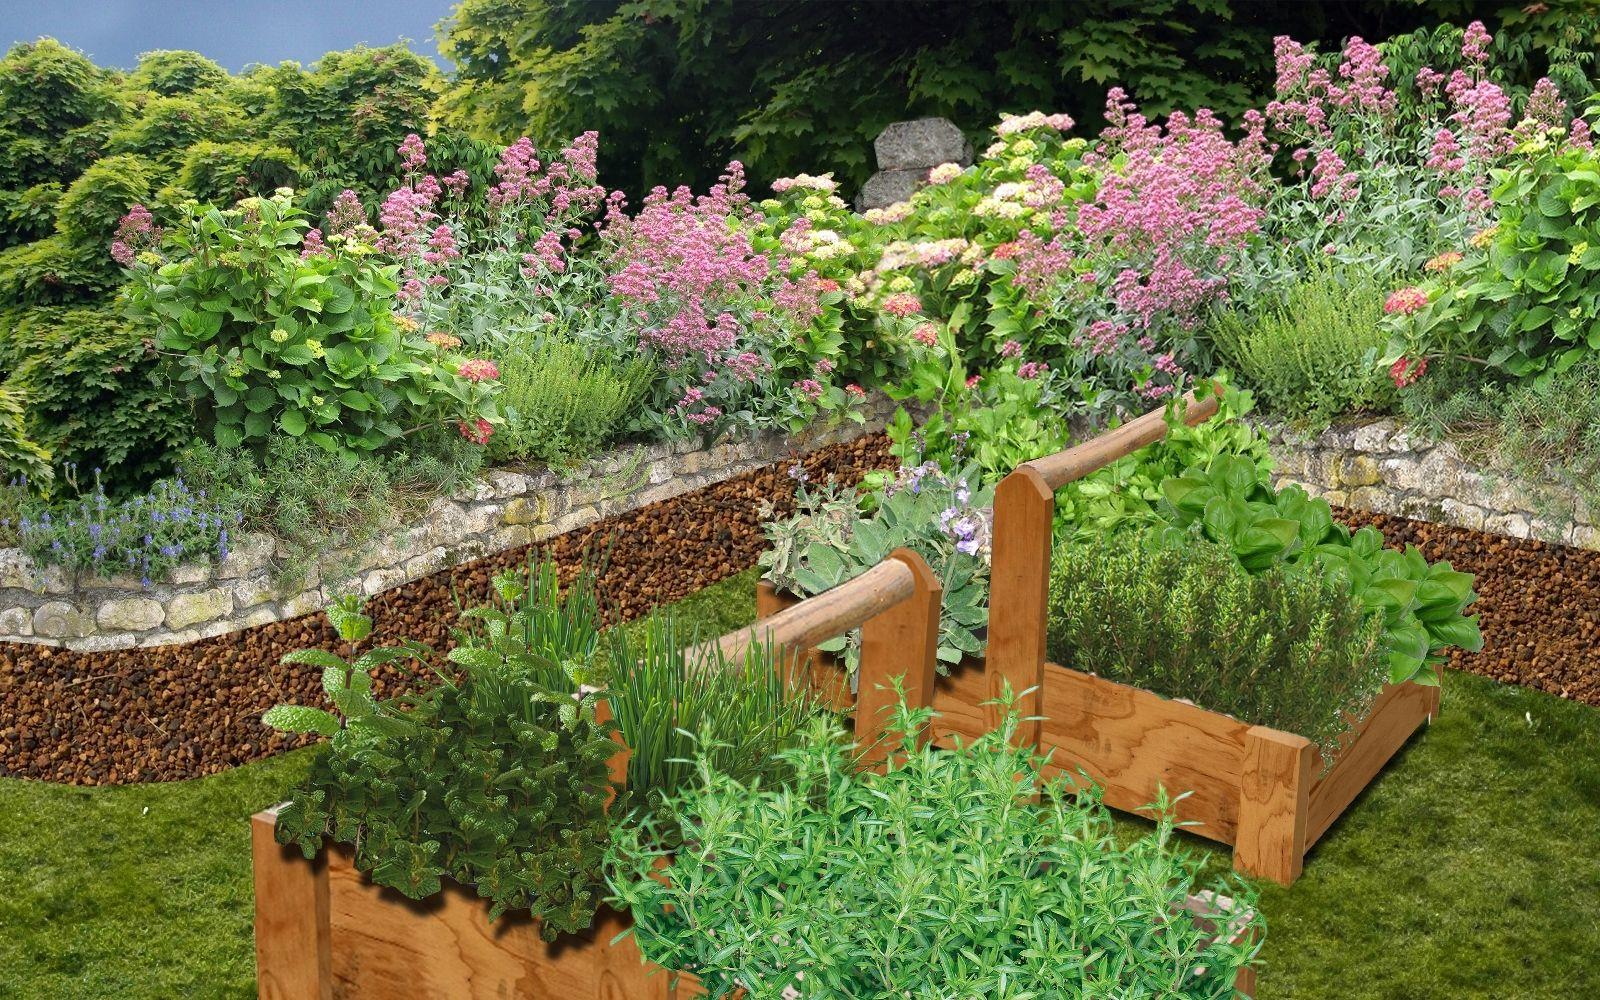 Jardin de plantes aromatiques jardin de simples for Destockage plantes jardin